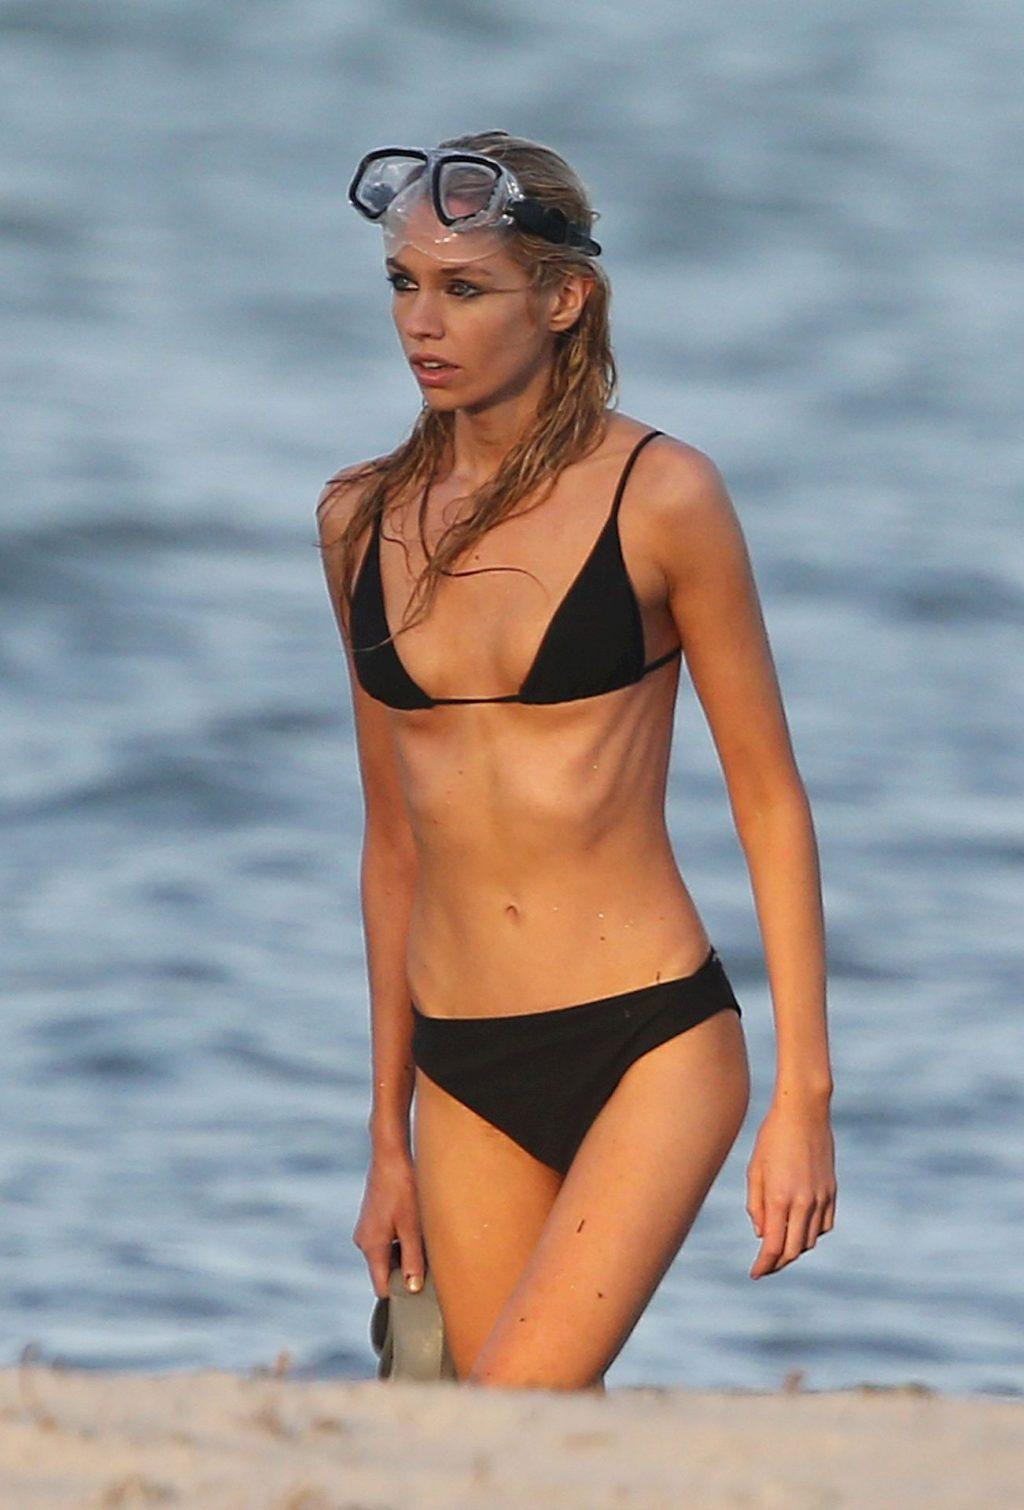 Stella Maxwell Wears a Black String Bikini During a Photoshoot in Miami (48 Photos)